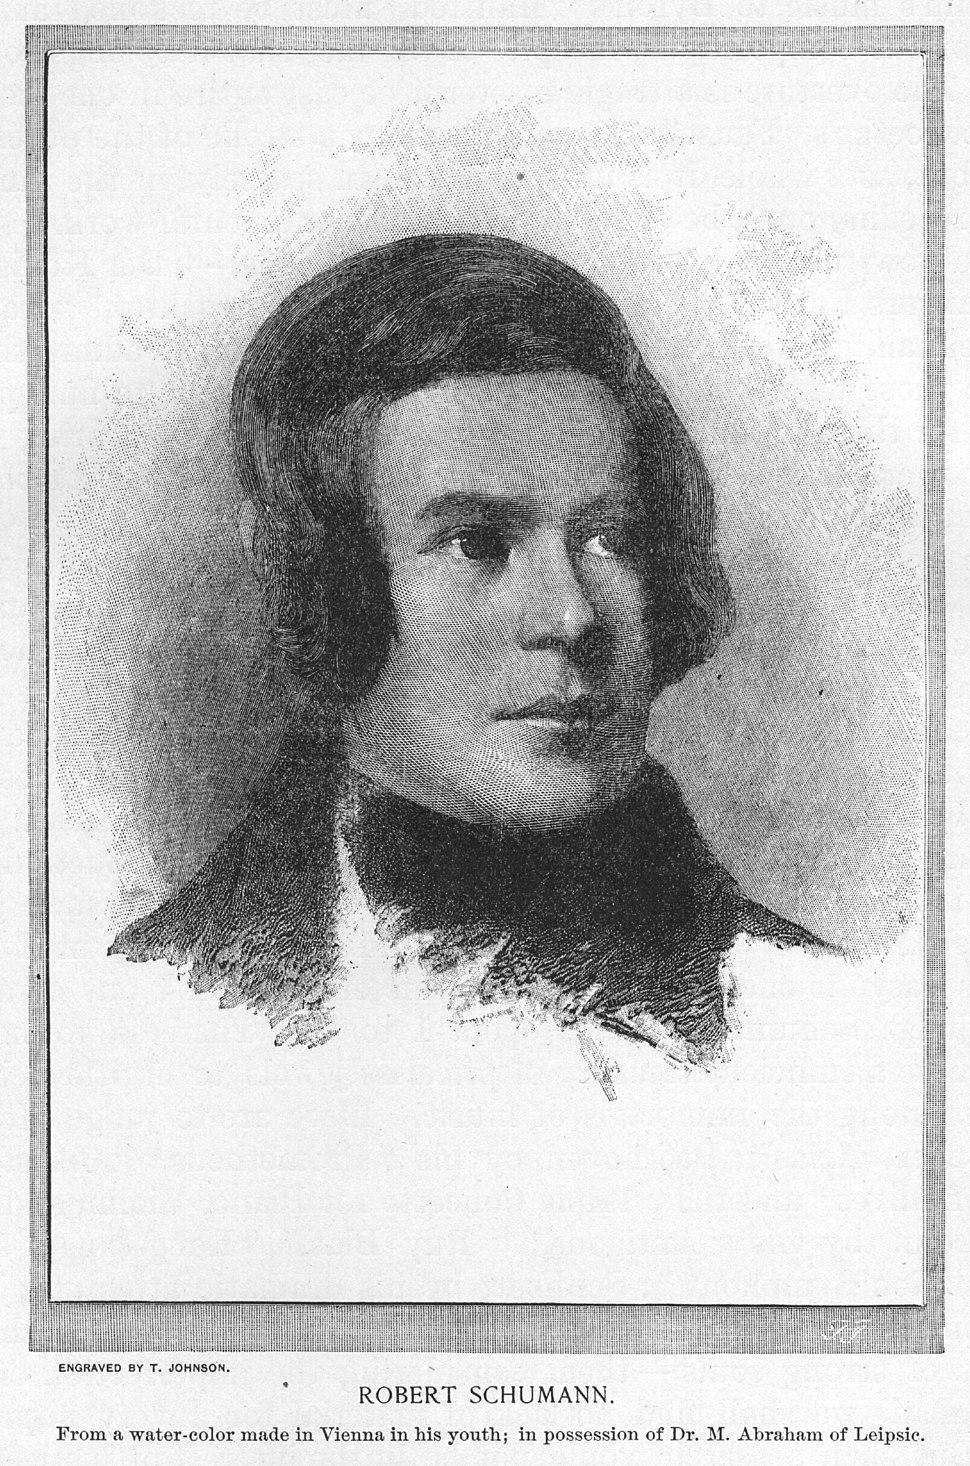 Robert Schumann in youth